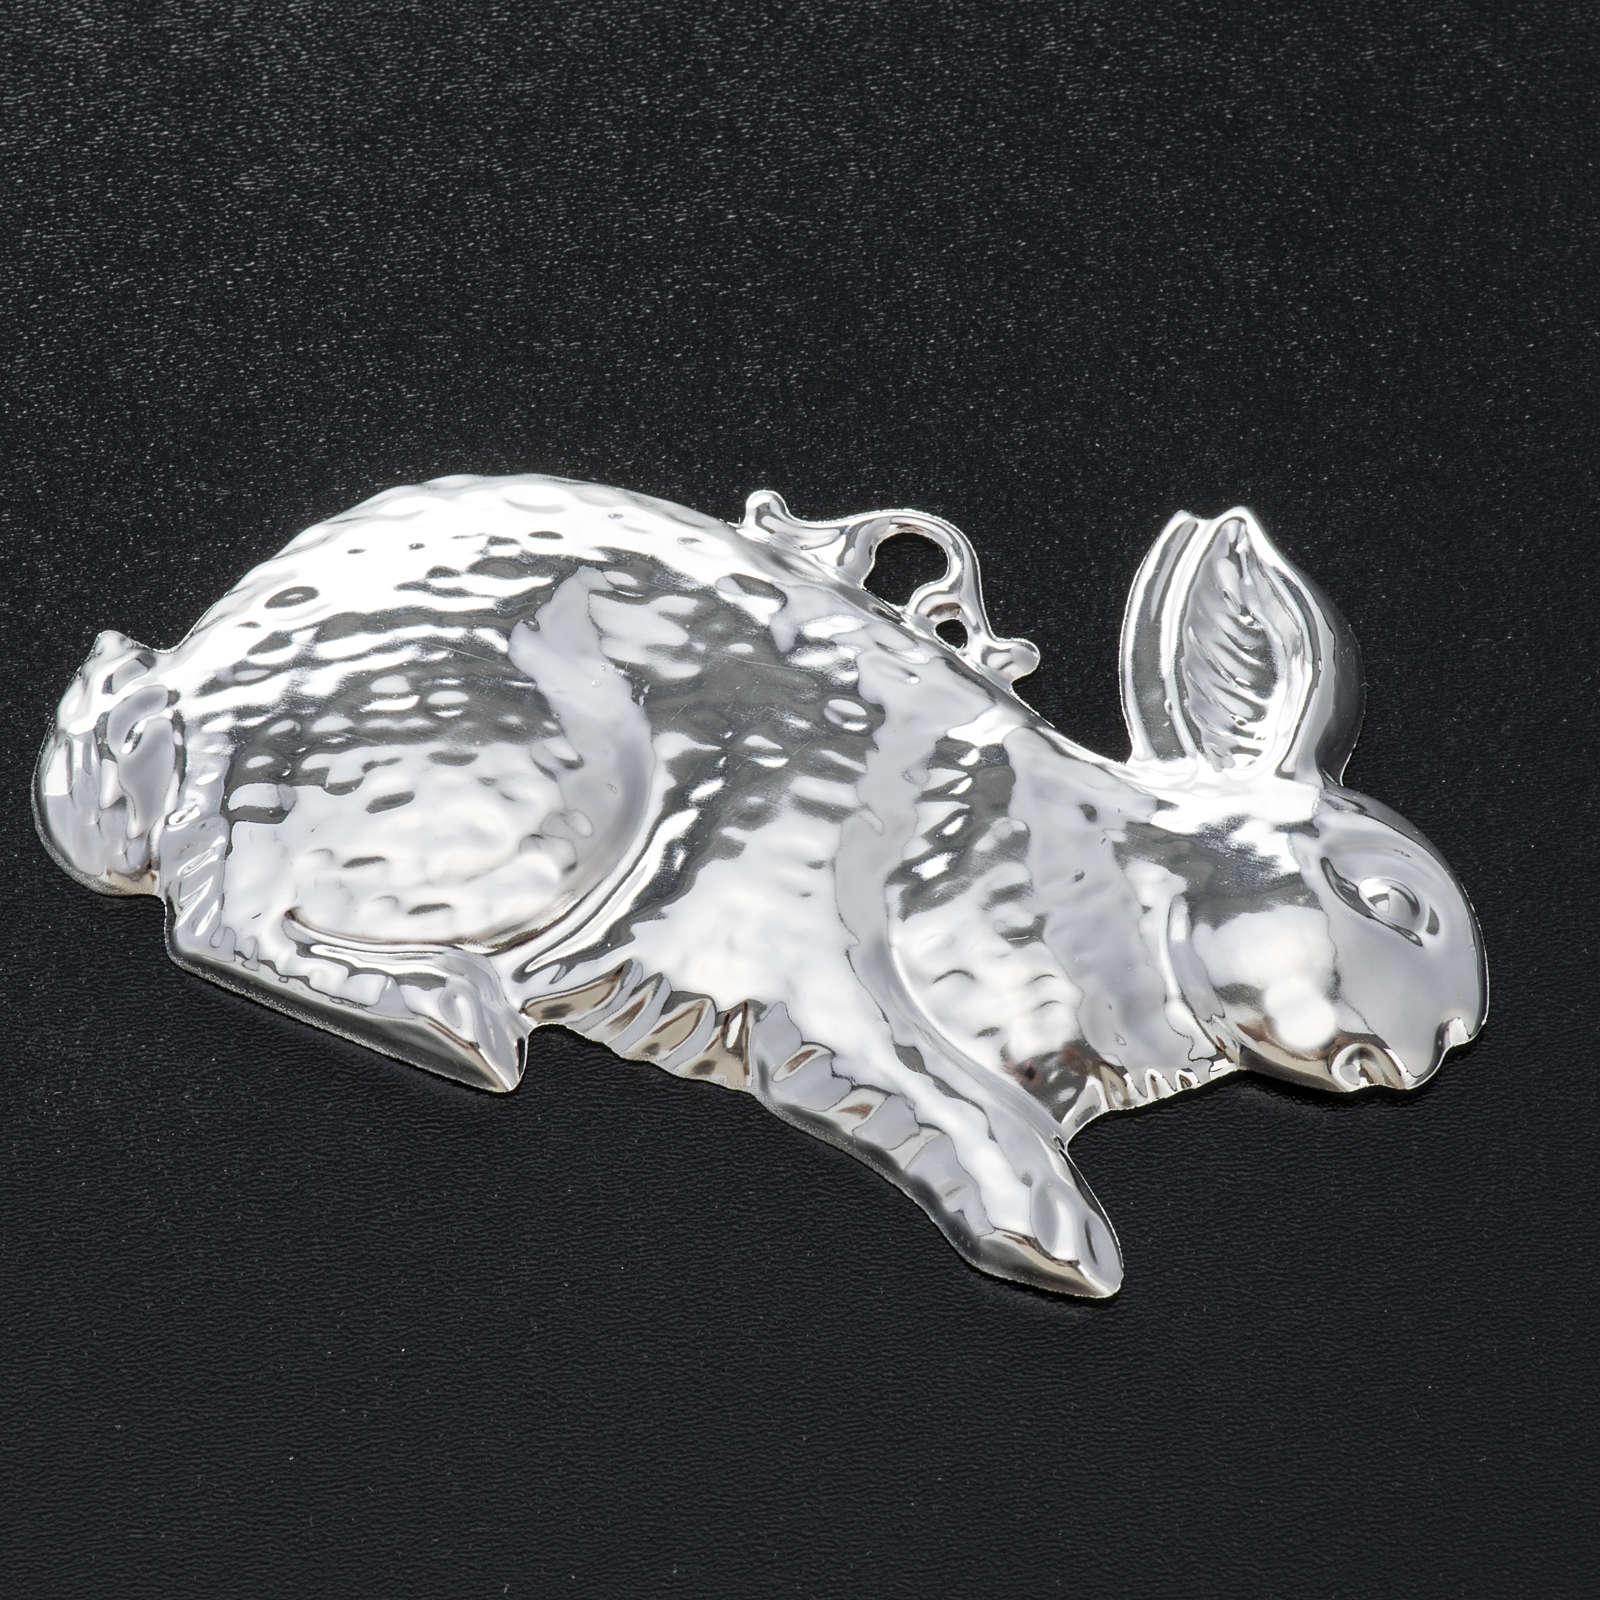 Exvoto coniglio argento 925 o metallo 10x6 cm 3